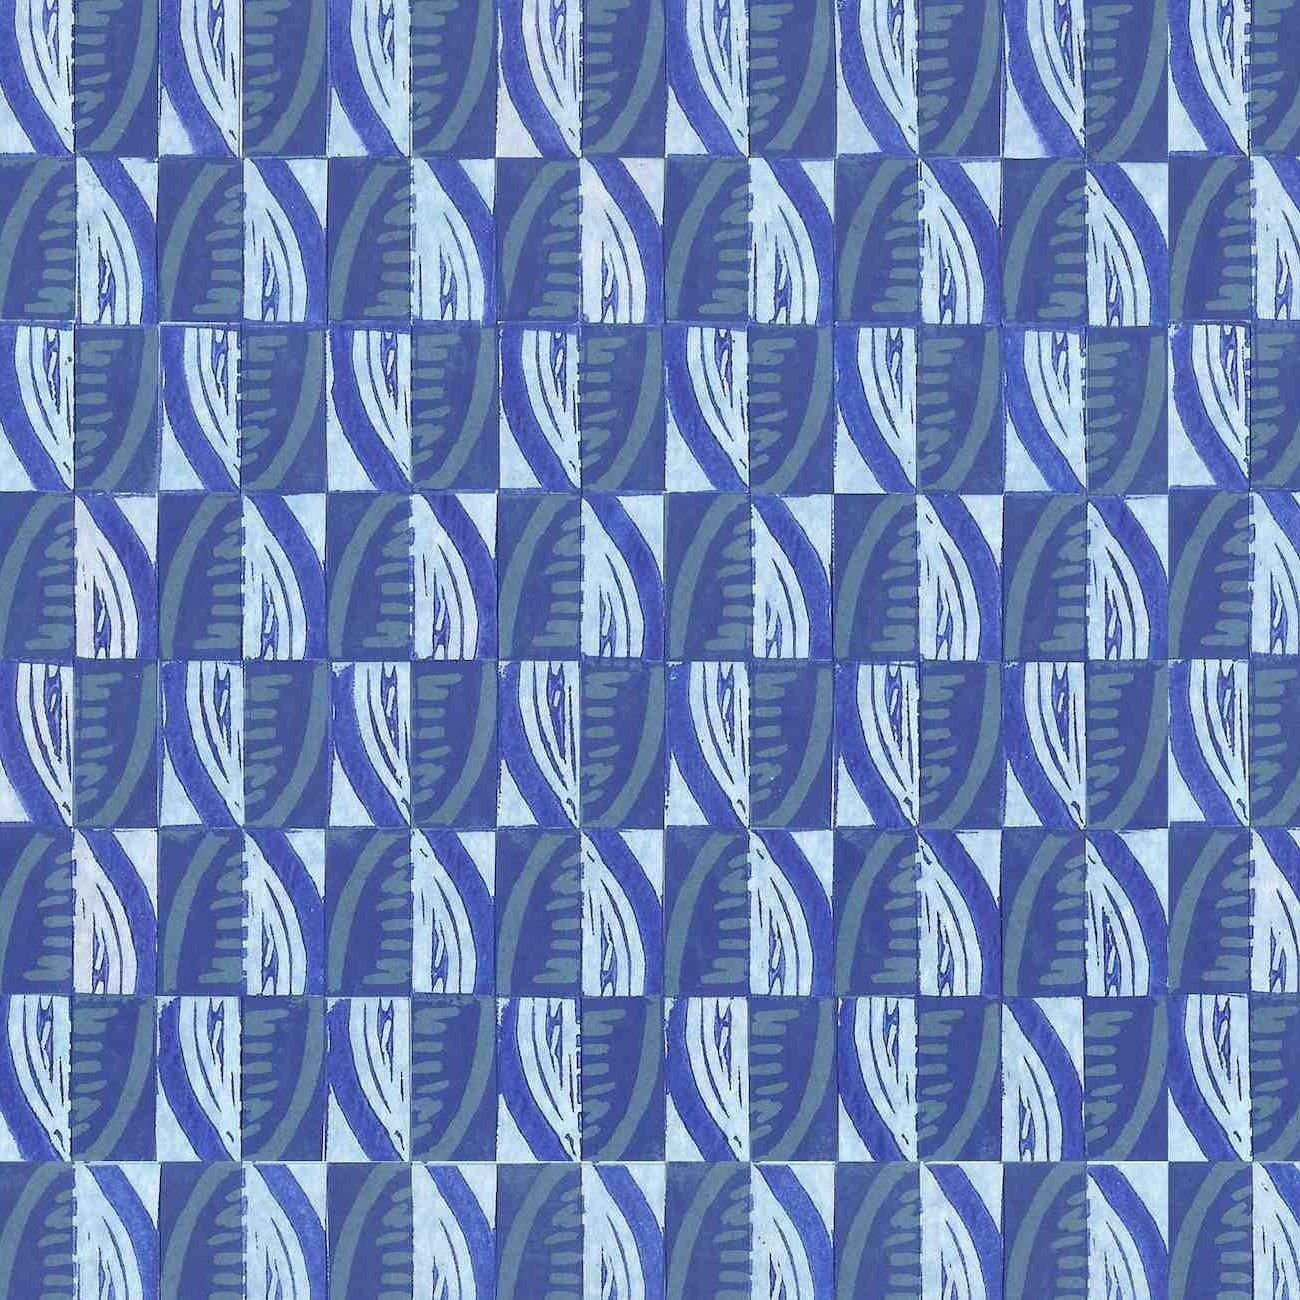 zb blue waves.jpg